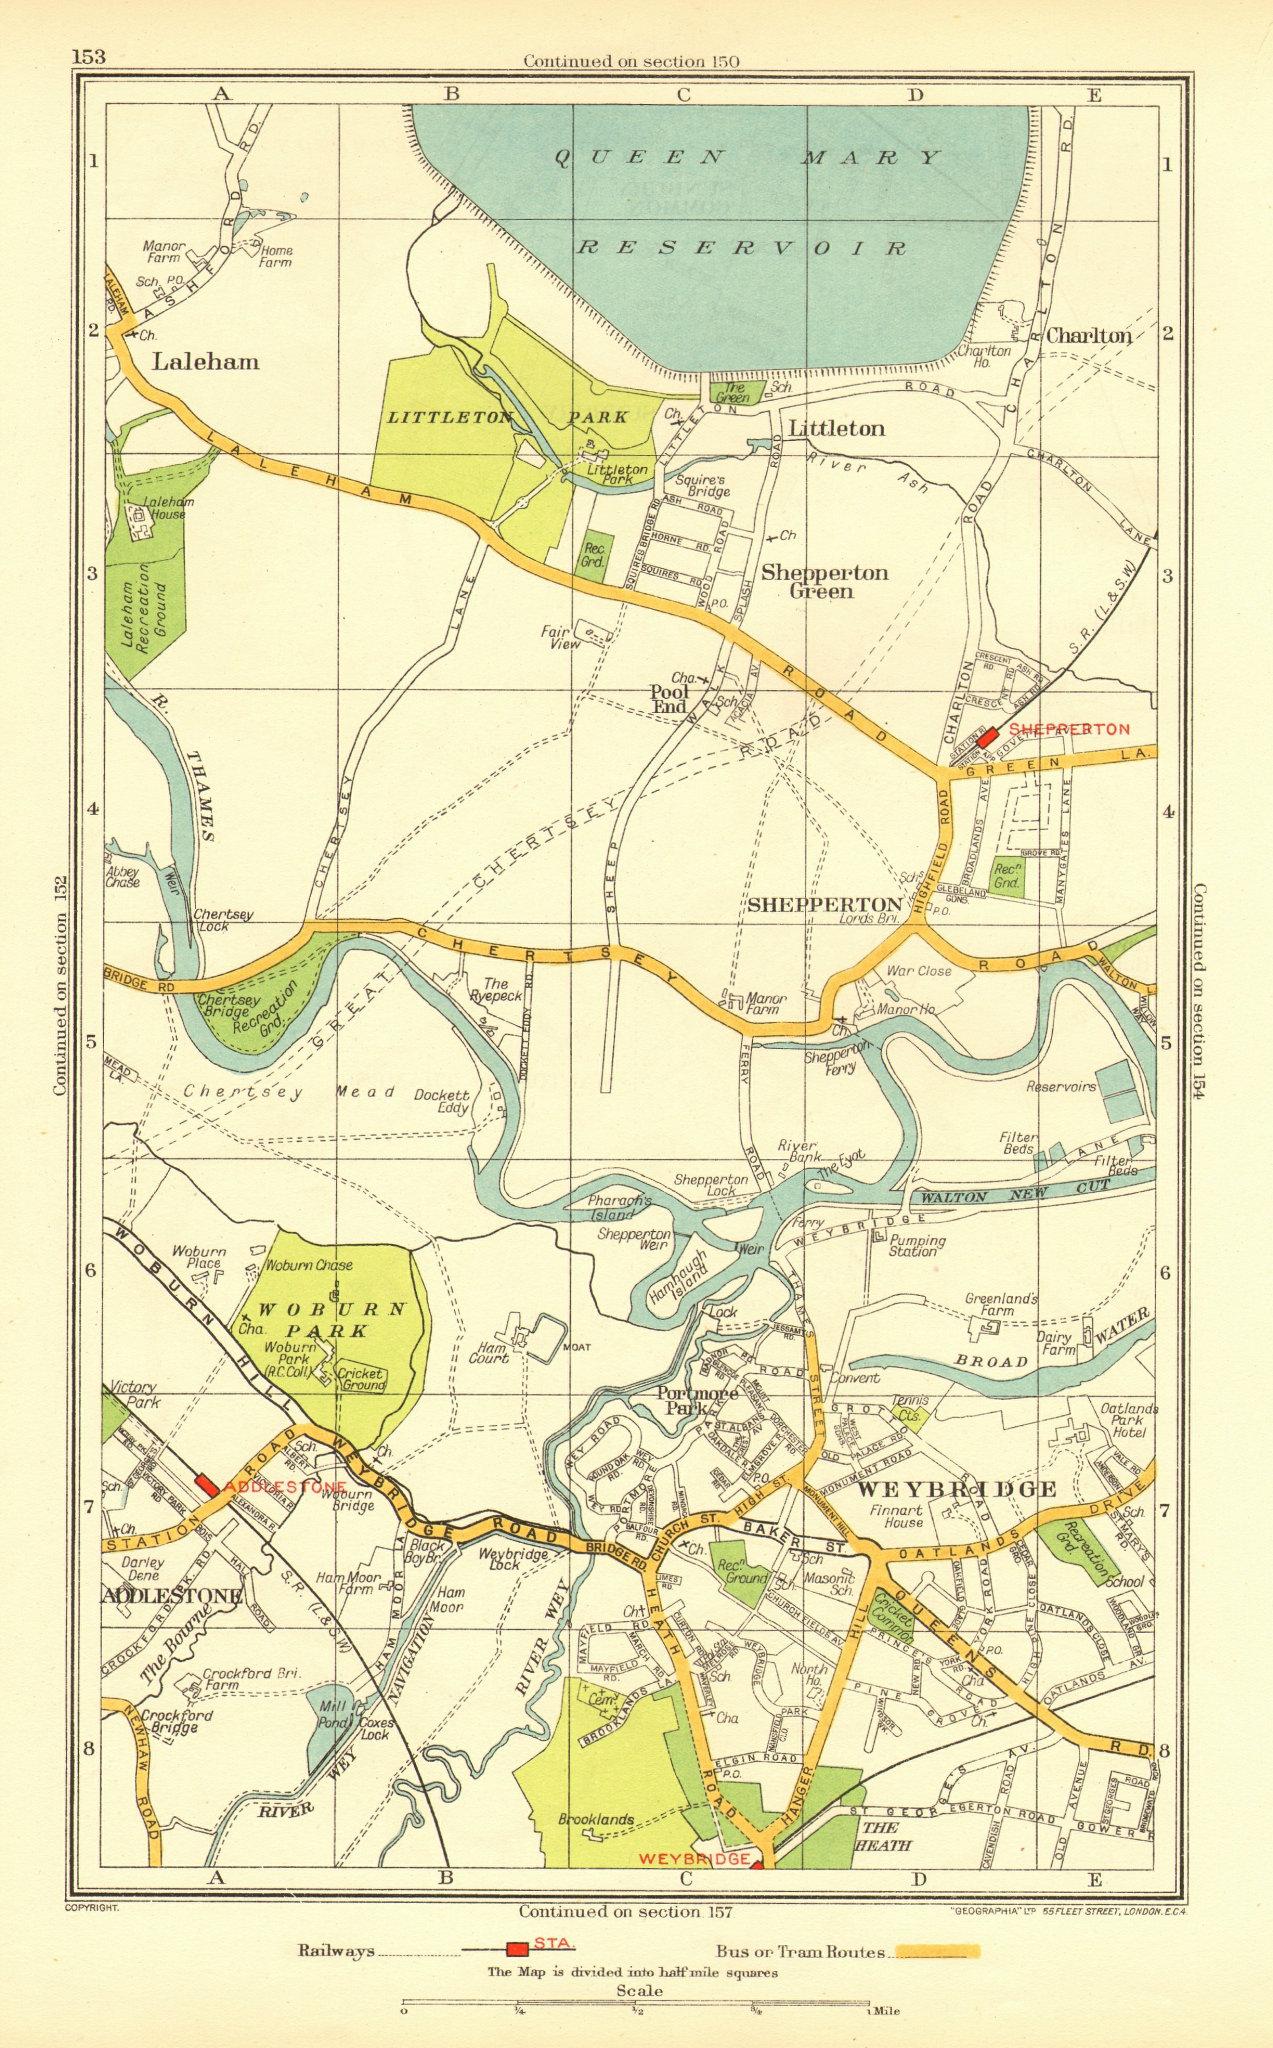 Associate Product WEYBRIDGE. Halliford Shepperton Littleton Addleston Laleham Charlton 1937 map